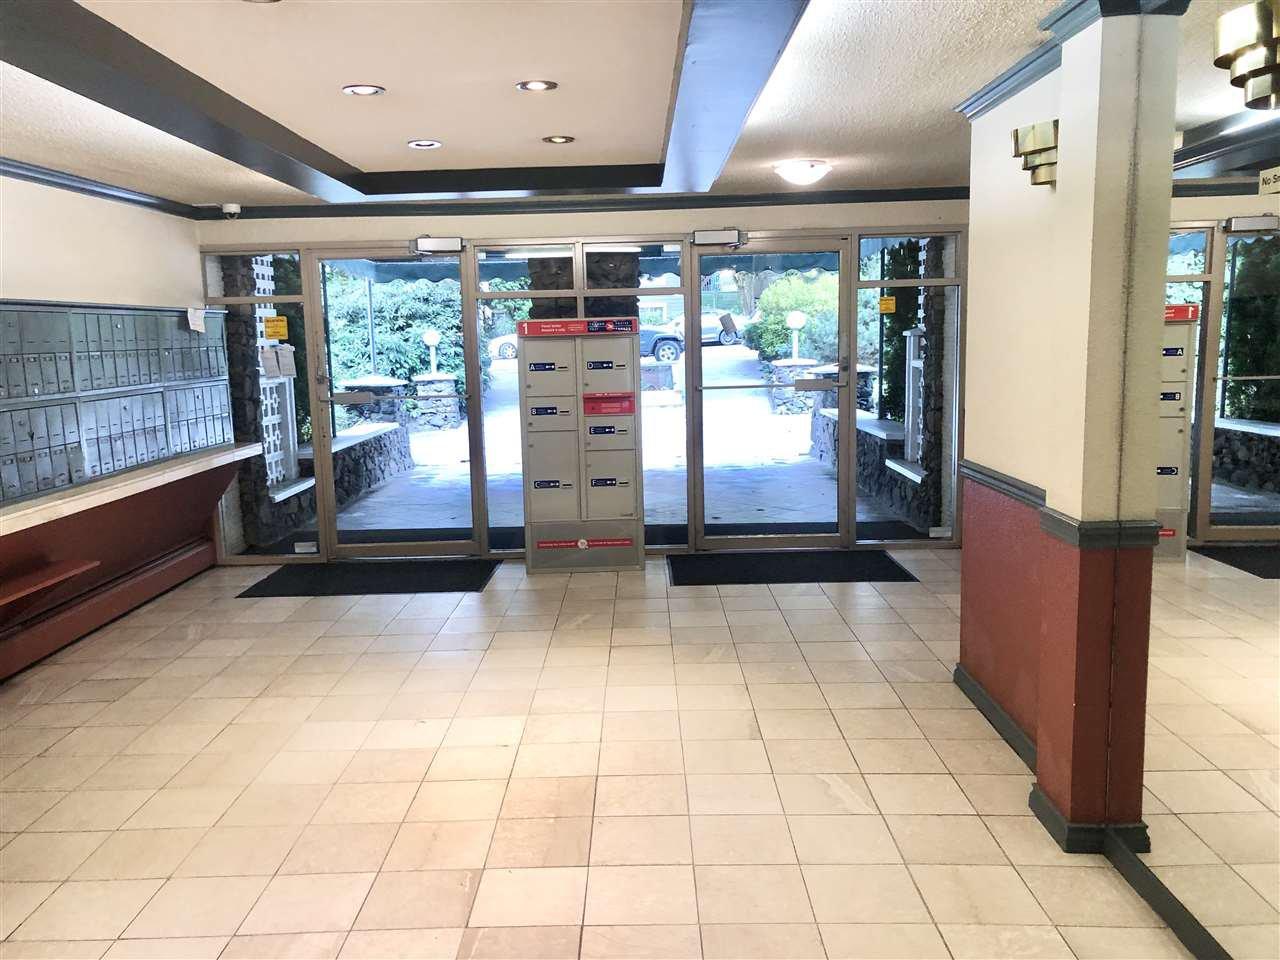 Main Photo: 311 711 E 6TH Avenue in Vancouver: Mount Pleasant VE Condo for sale (Vancouver East)  : MLS®# R2480887